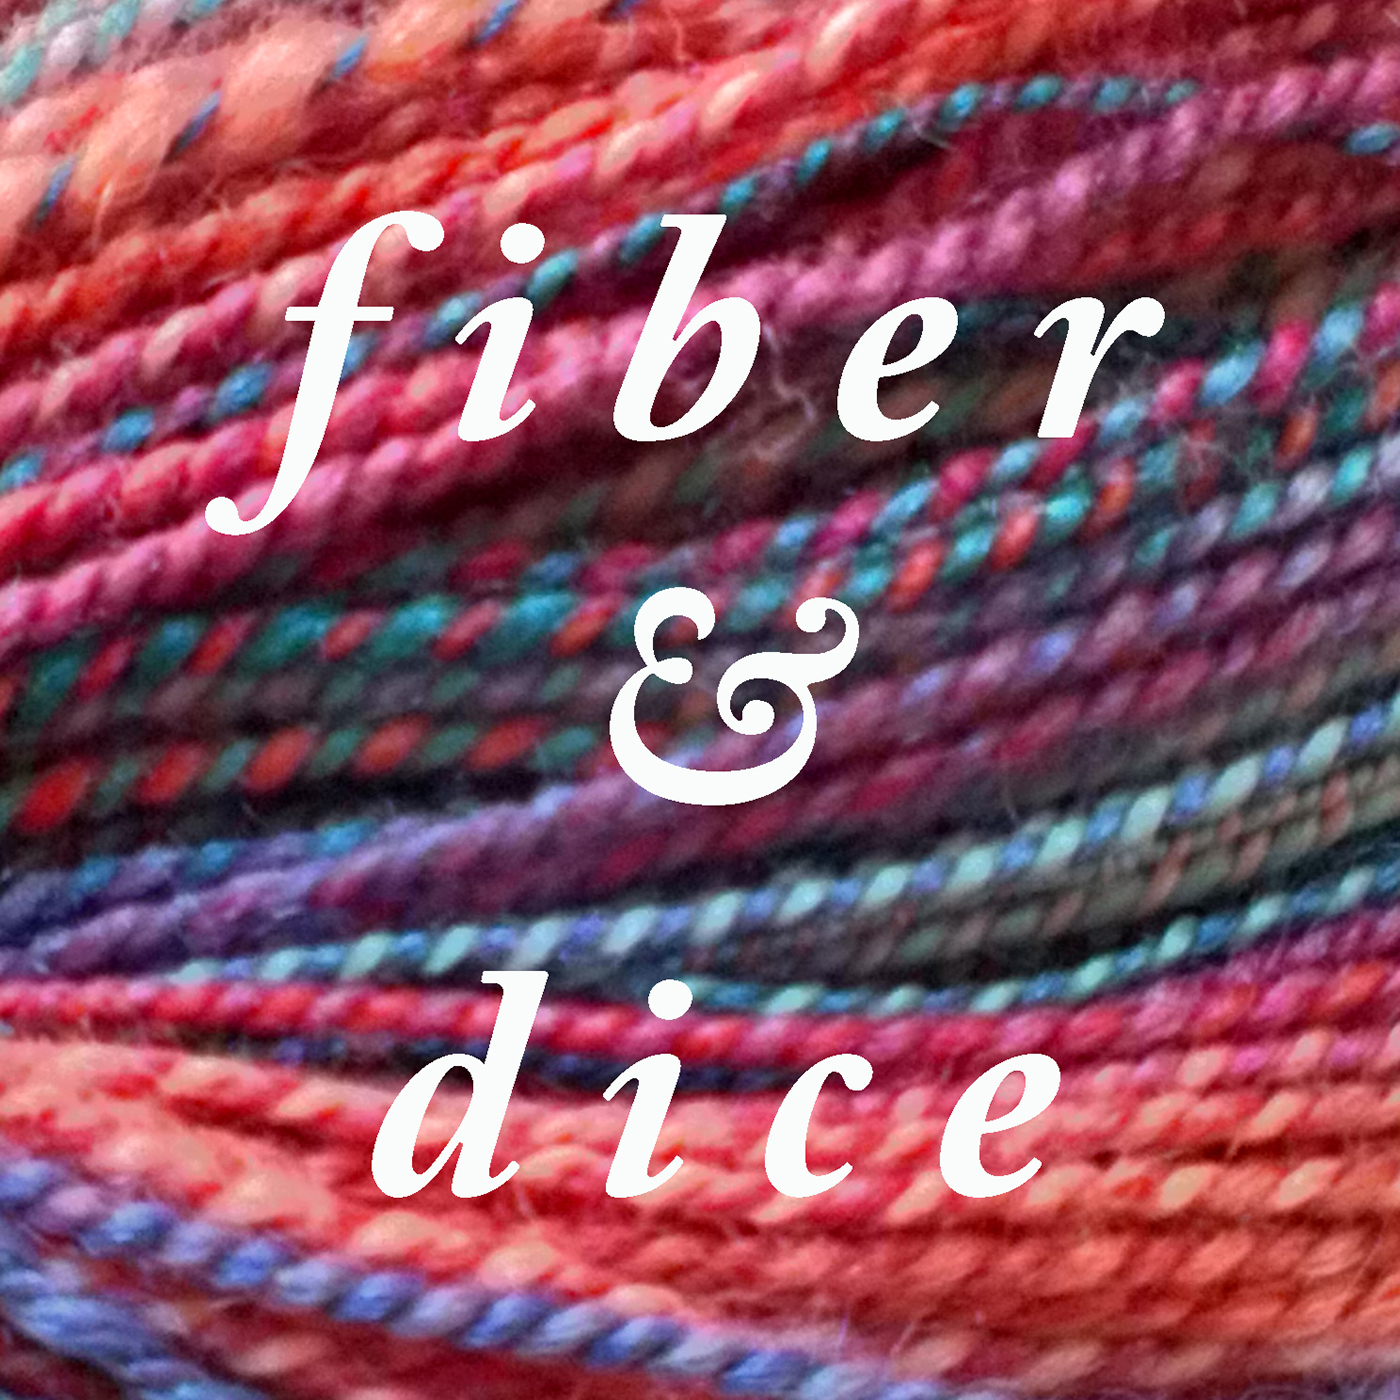 fiberanddice podcast show art